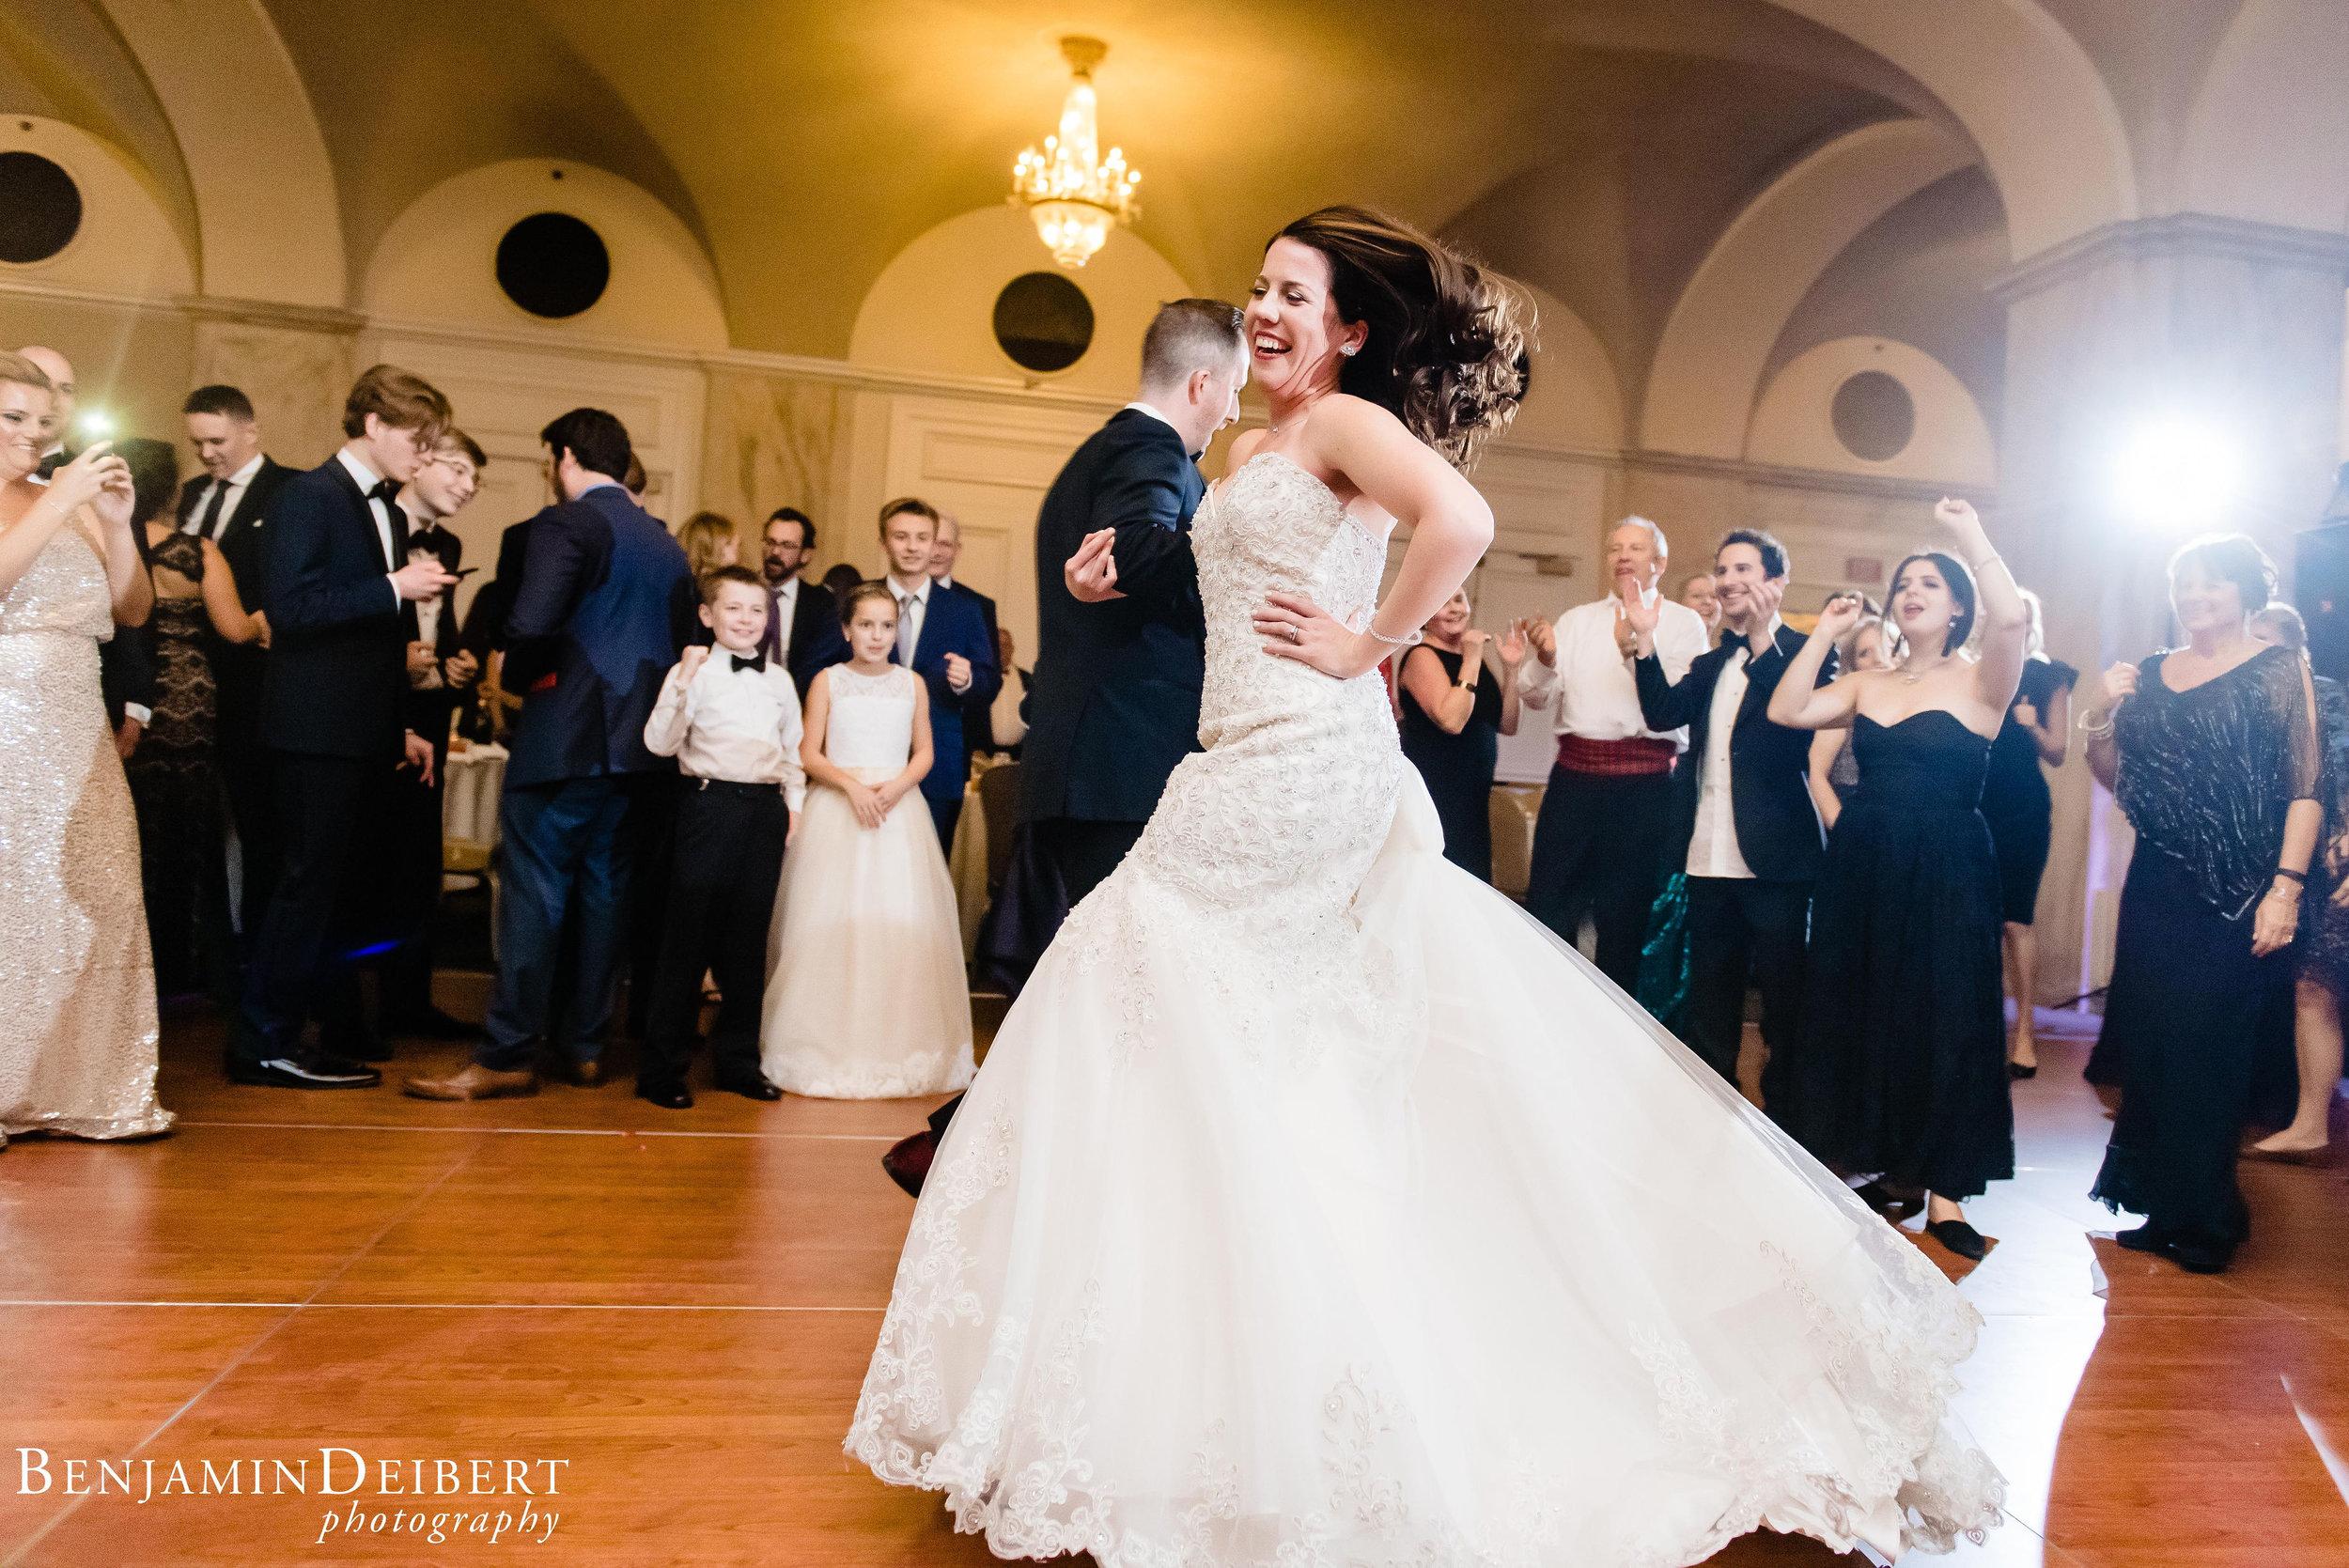 AlexandraandNicholas_RitzCarltonPhiladelphia_Wedding-108.jpg